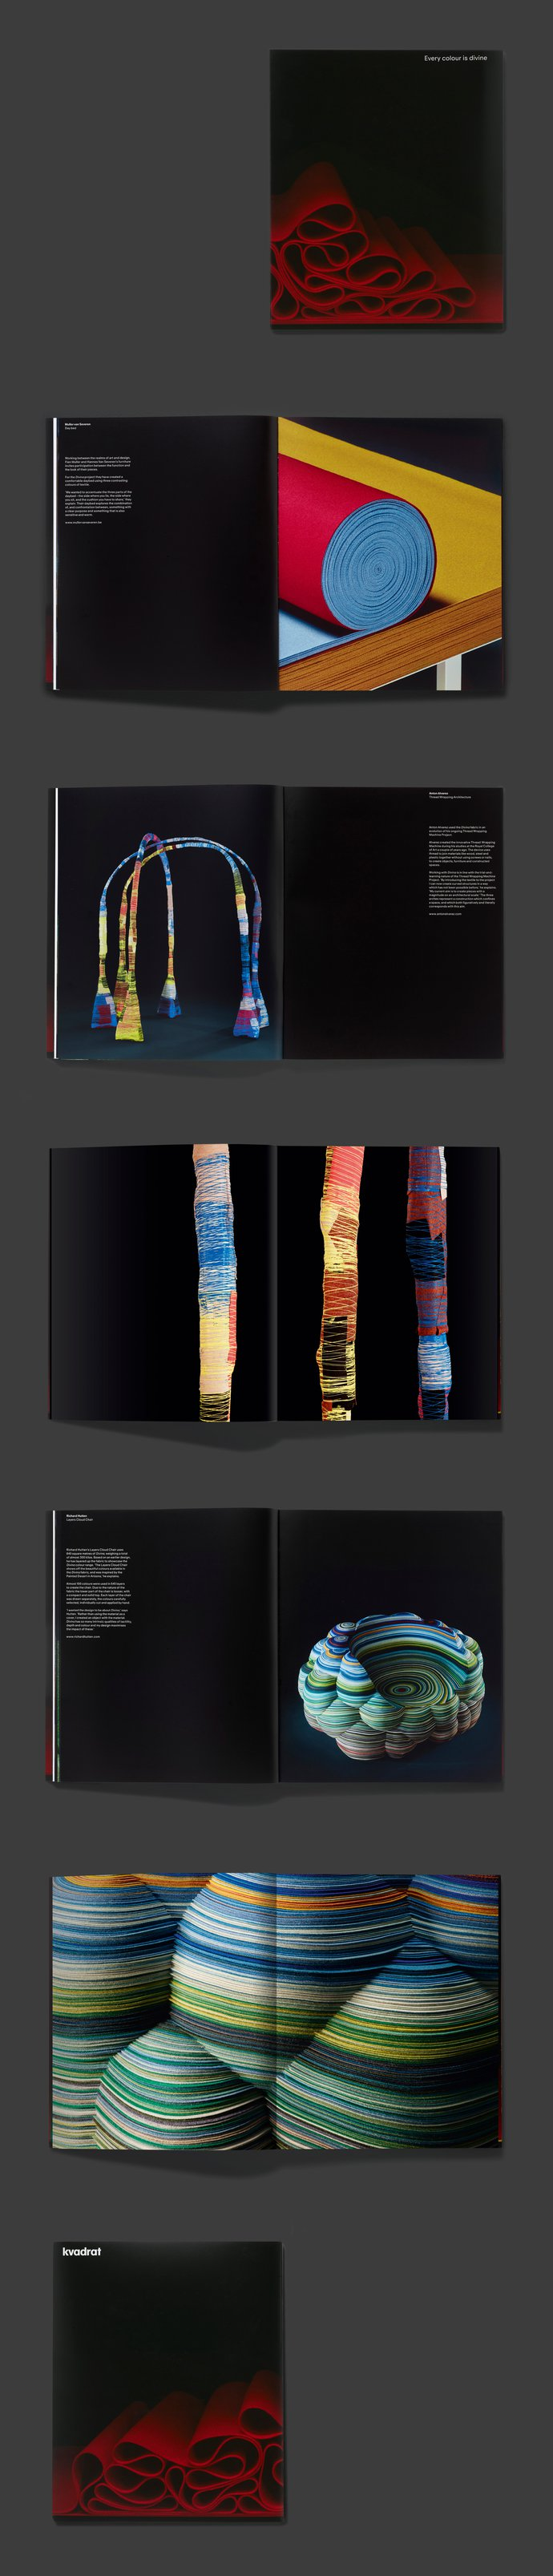 Kvadrat – Divina, 2014 (Campaign), image 6